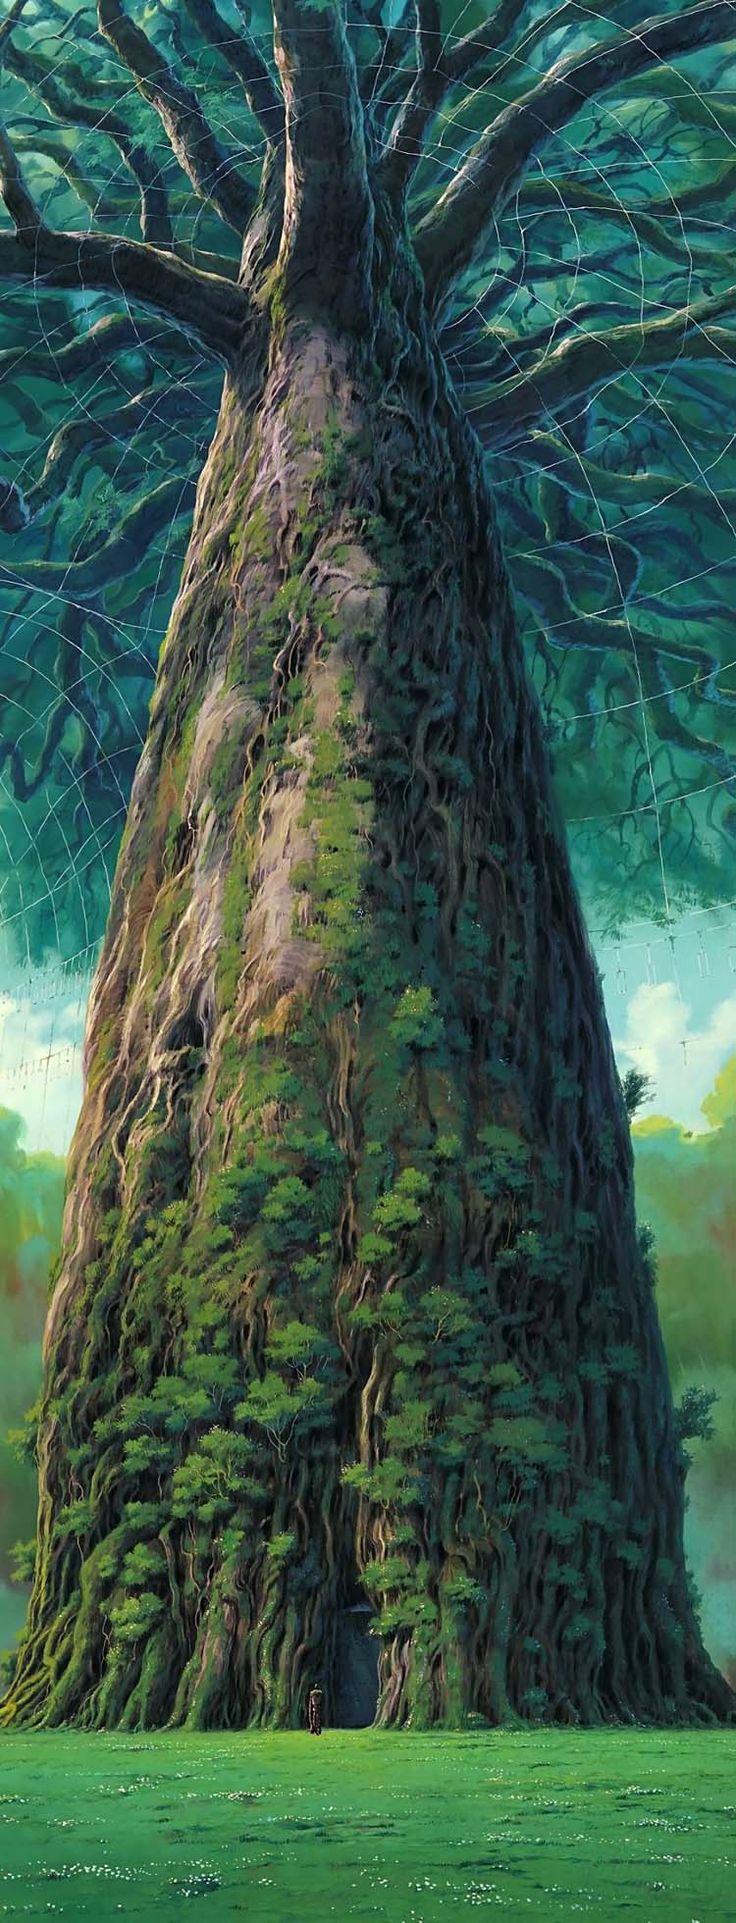 Free Studio Ghibli Smartphone Wallpapers